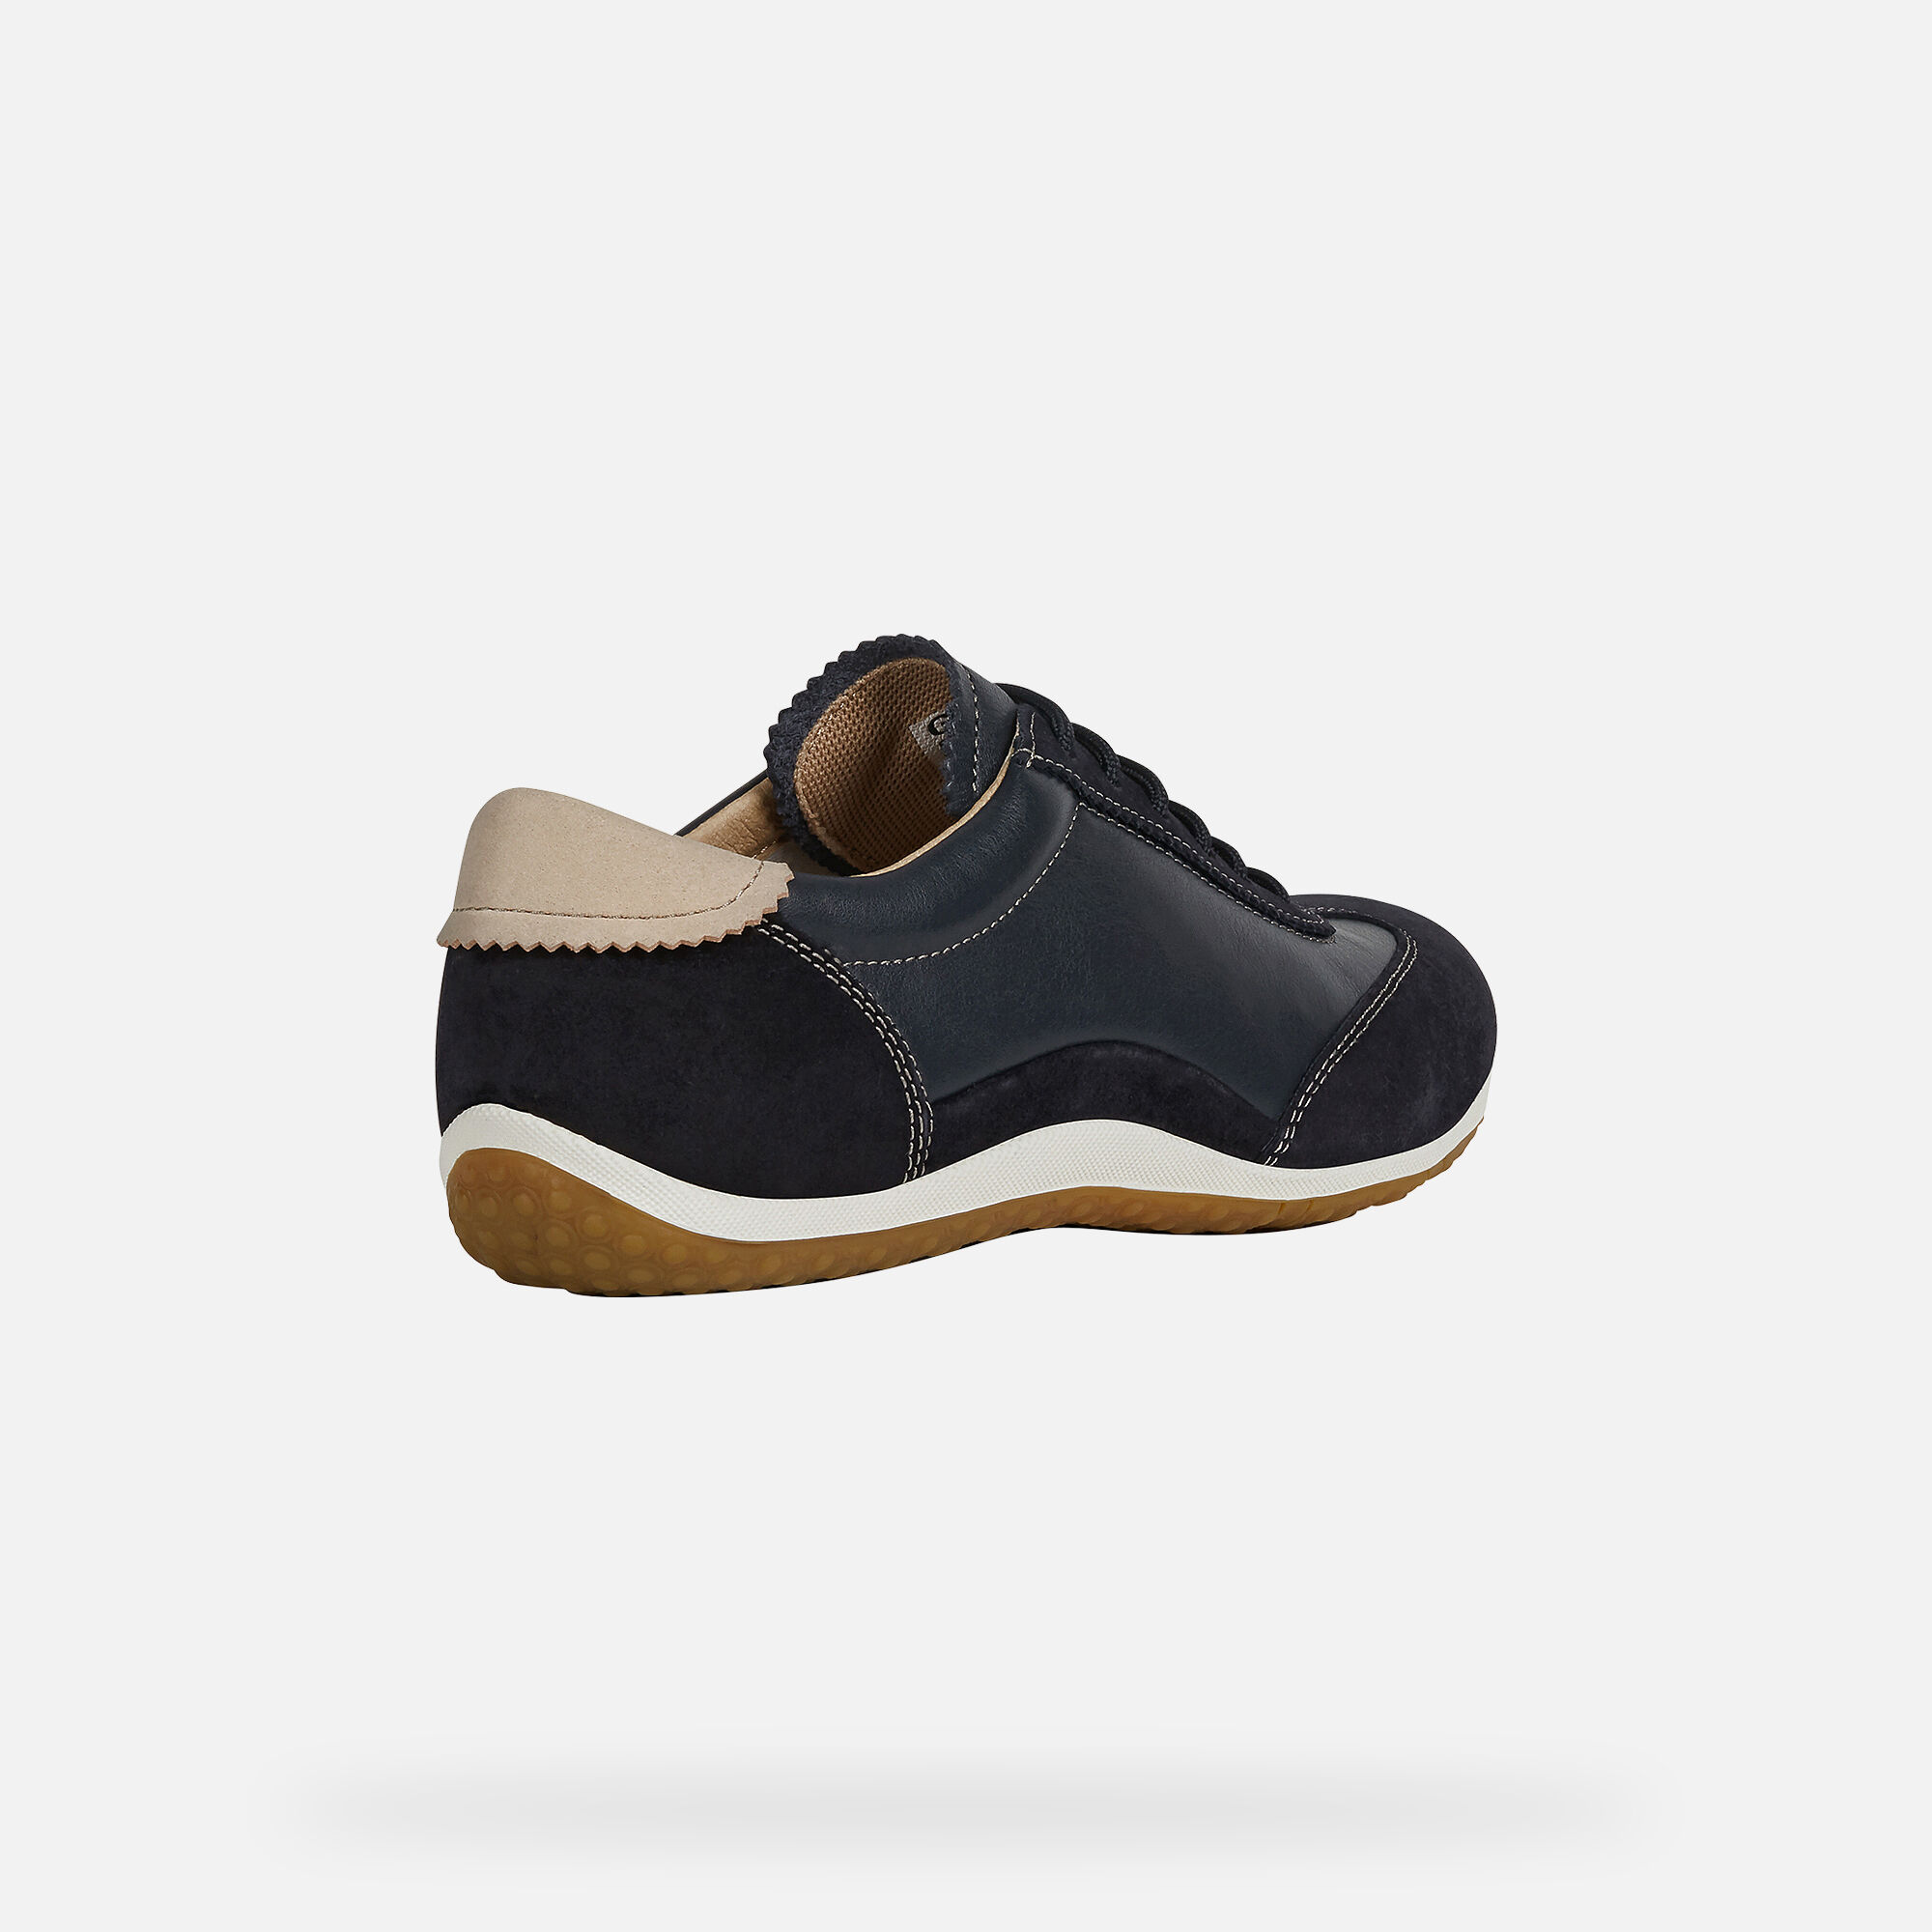 Geox VEGA VEGA SneakersGeox WomanNavy SS20 SS20 Geox